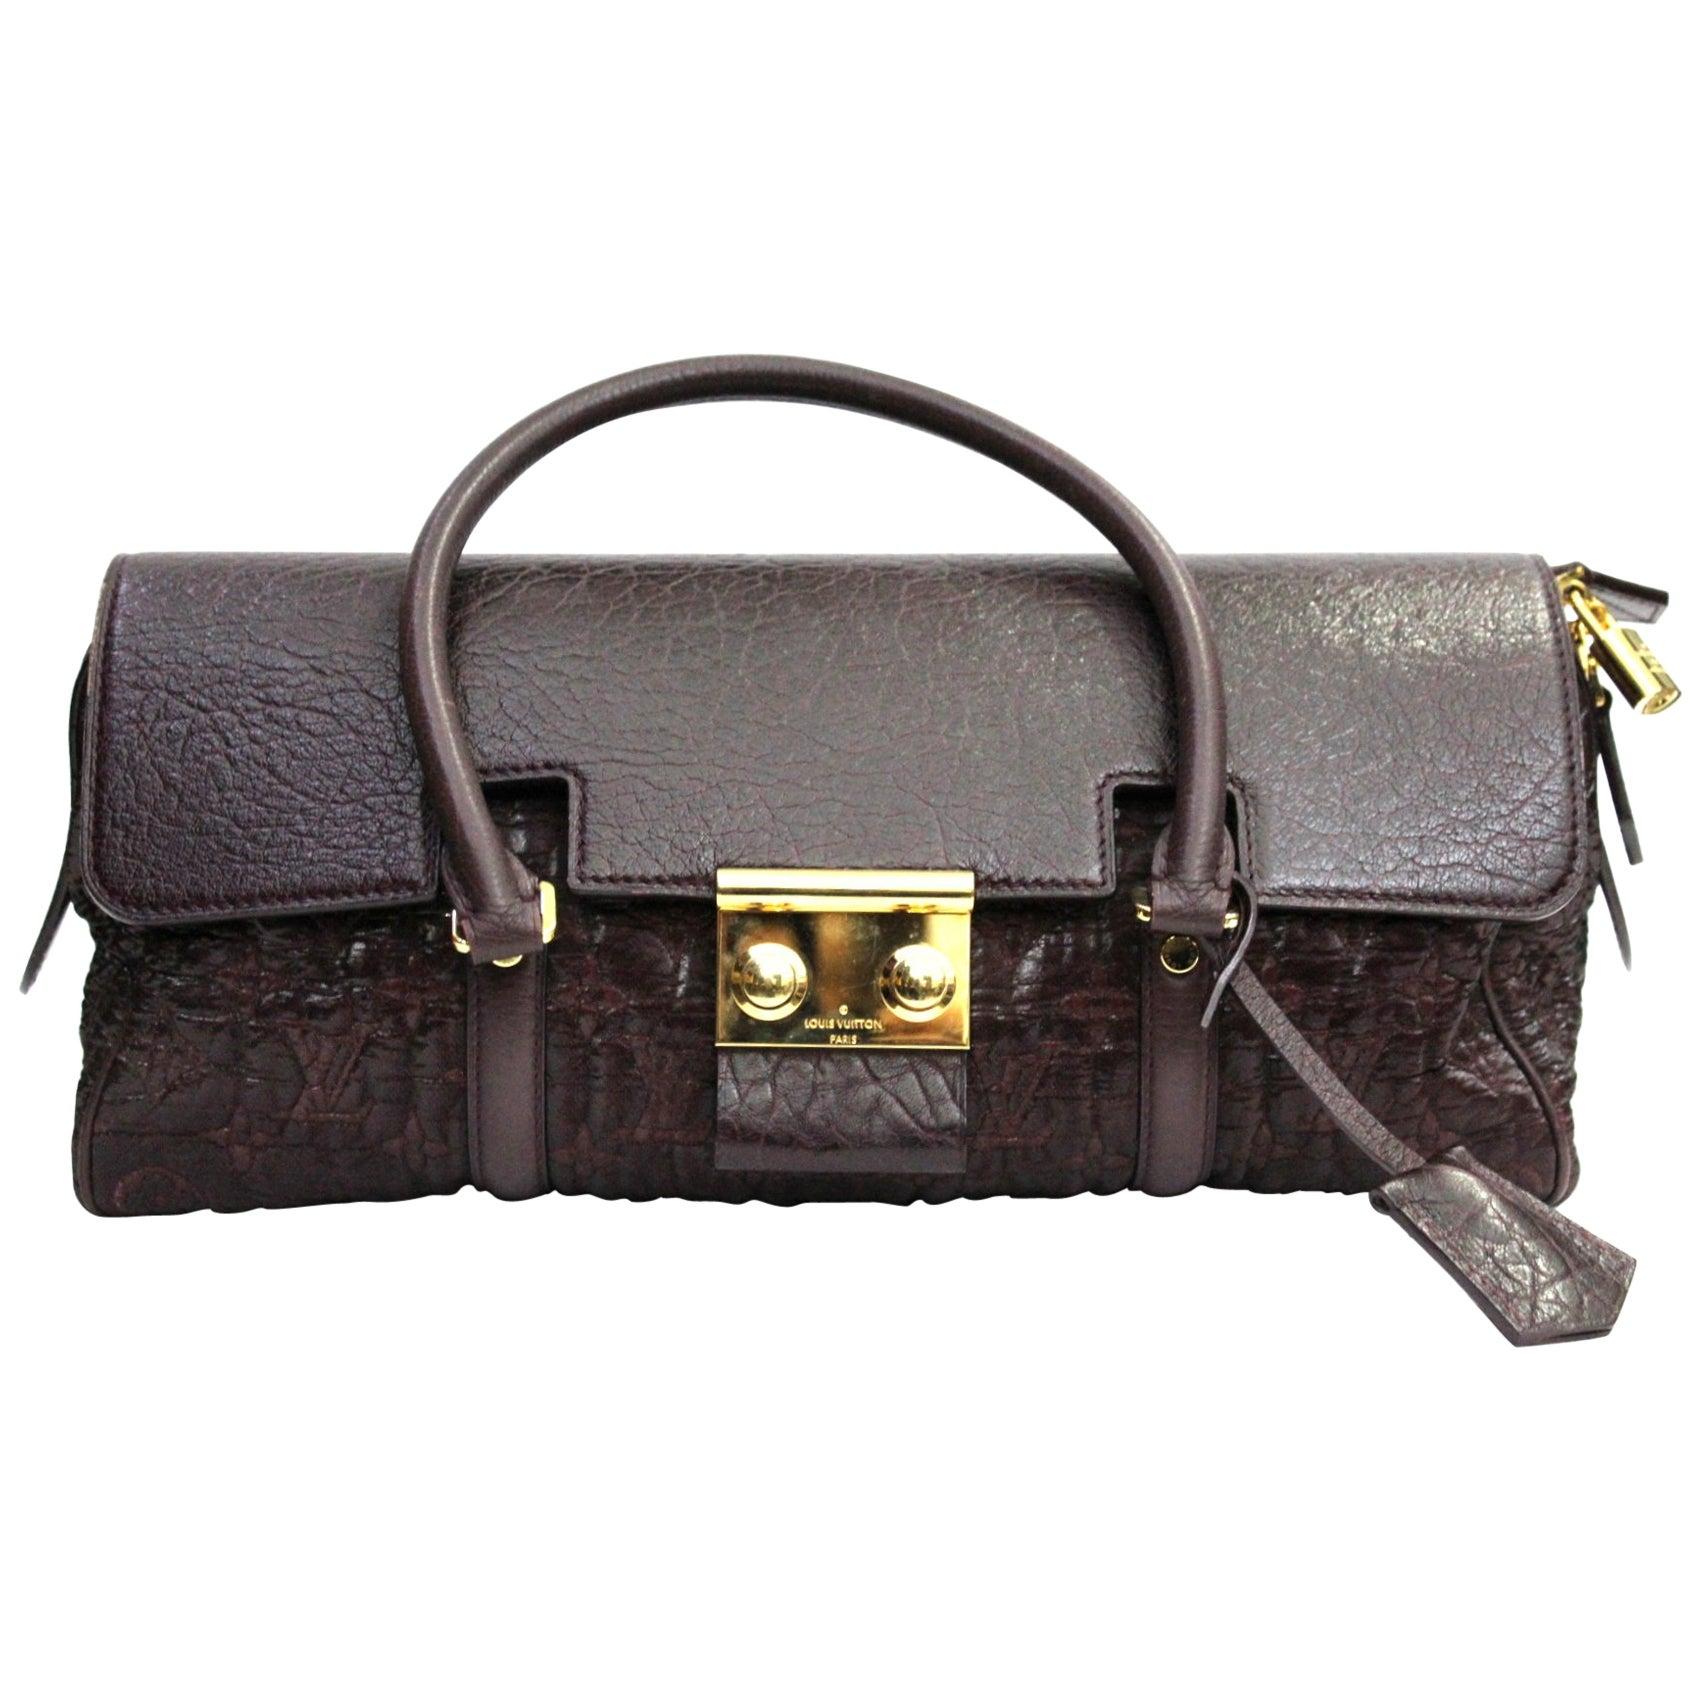 af2f13c99691 LOUIS VUITTON Limited Edition Amethyst Monogram Volupte Beaute Bag at  1stdibs